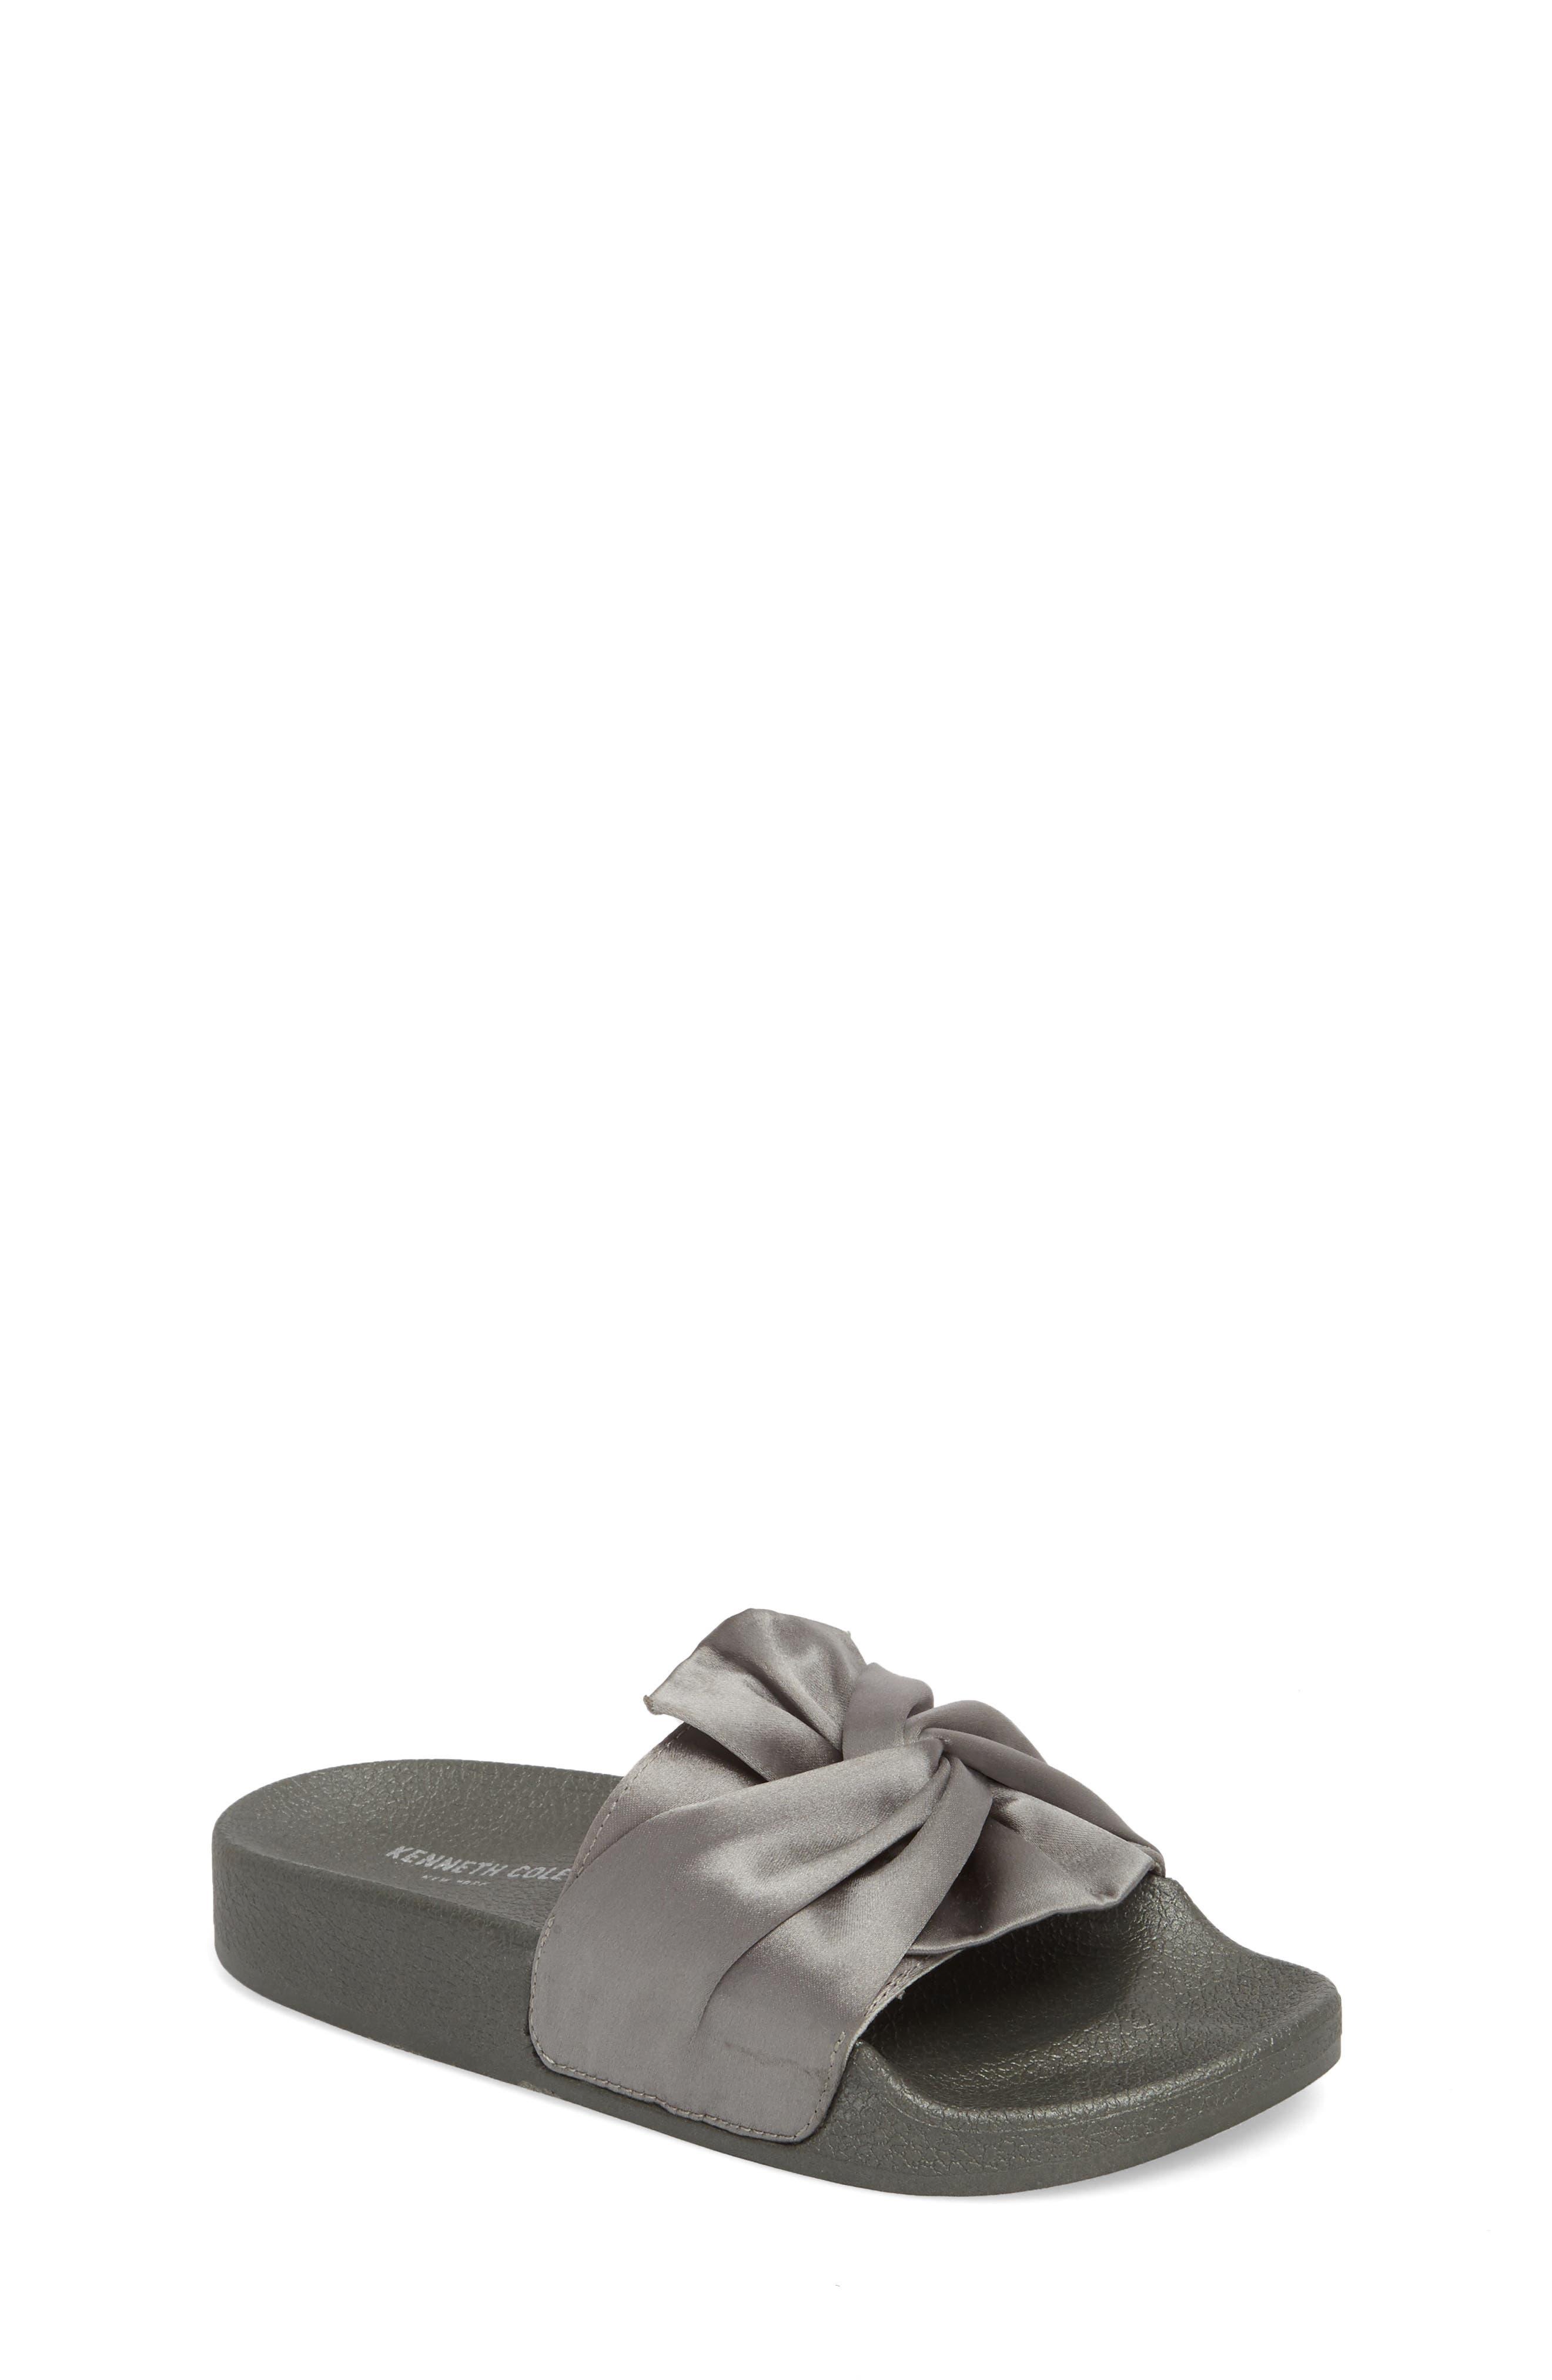 Shower Twist Slide Sandal,                         Main,                         color, GRAY